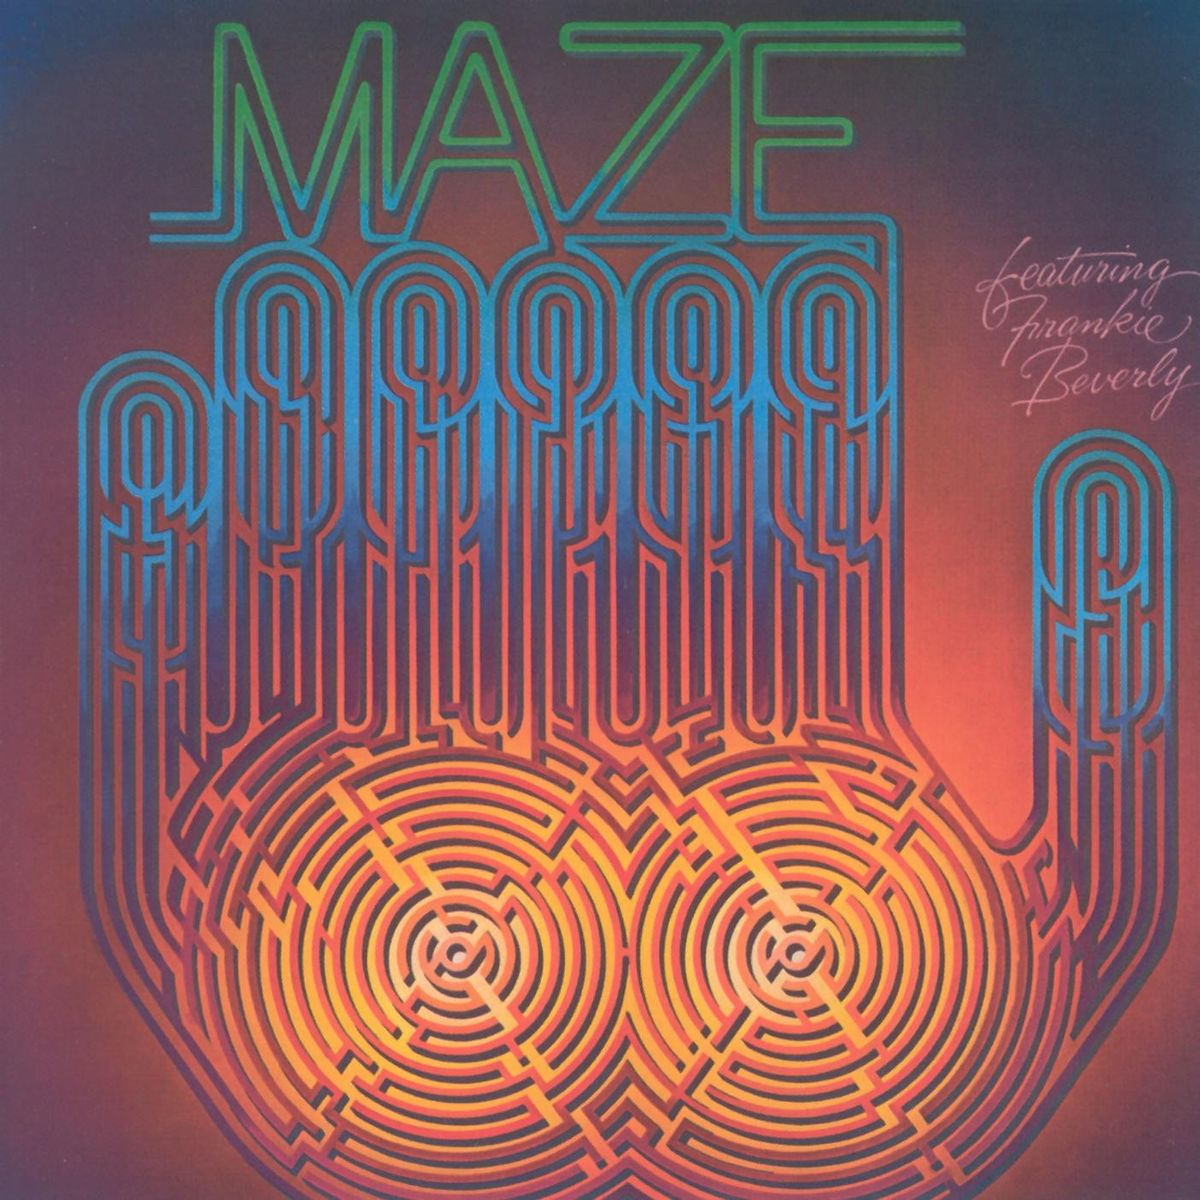 Art for Happy Feelings (Clean) by Maze & Frankie Beverly